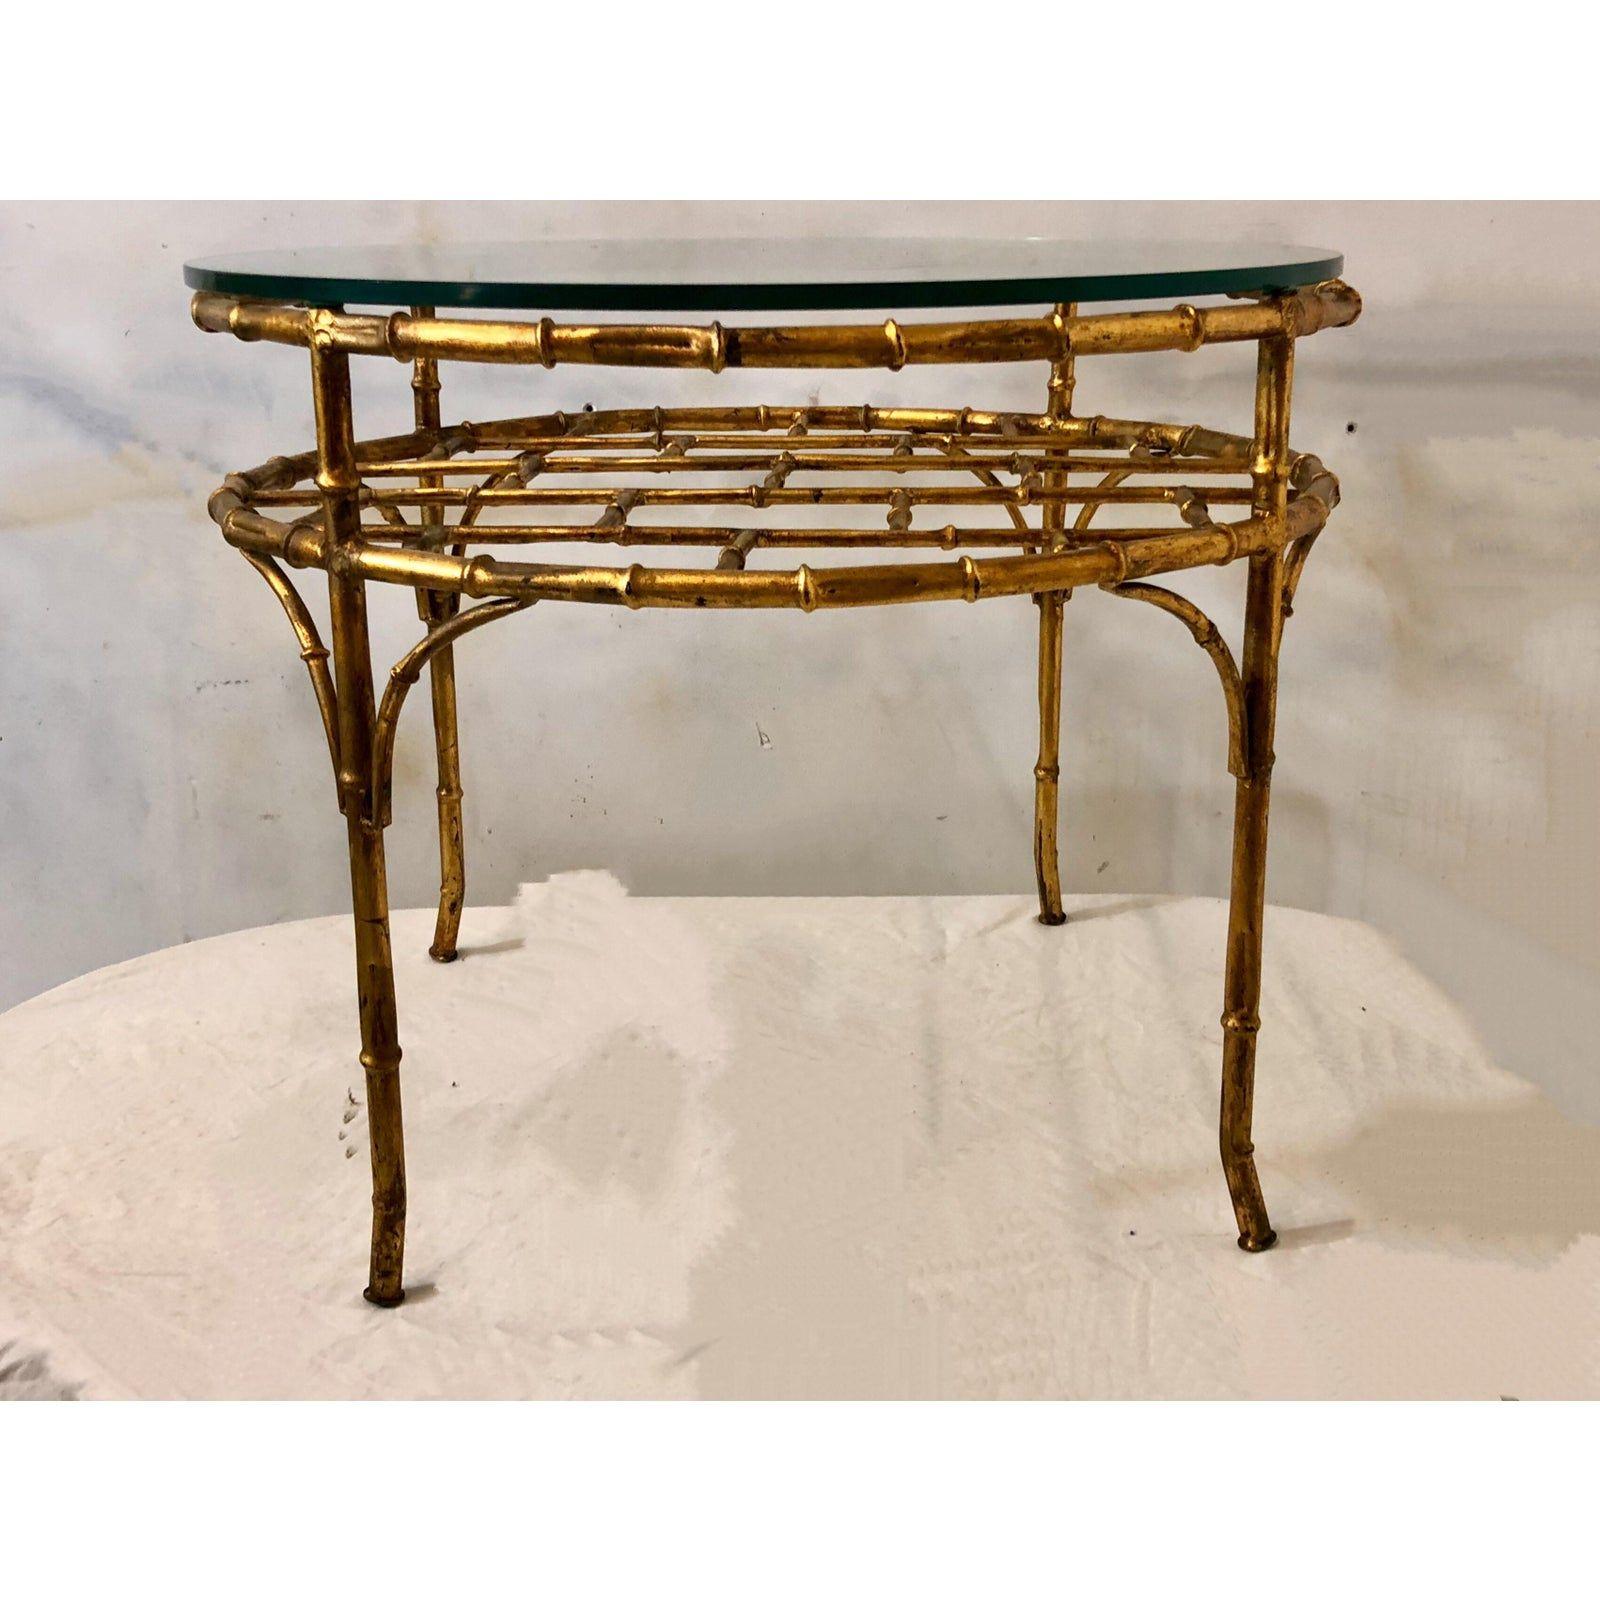 Gilt Metal Faux Bamboo Coffee Table Chairish Bamboo Coffee Table Table Coffee Table [ 1600 x 1600 Pixel ]